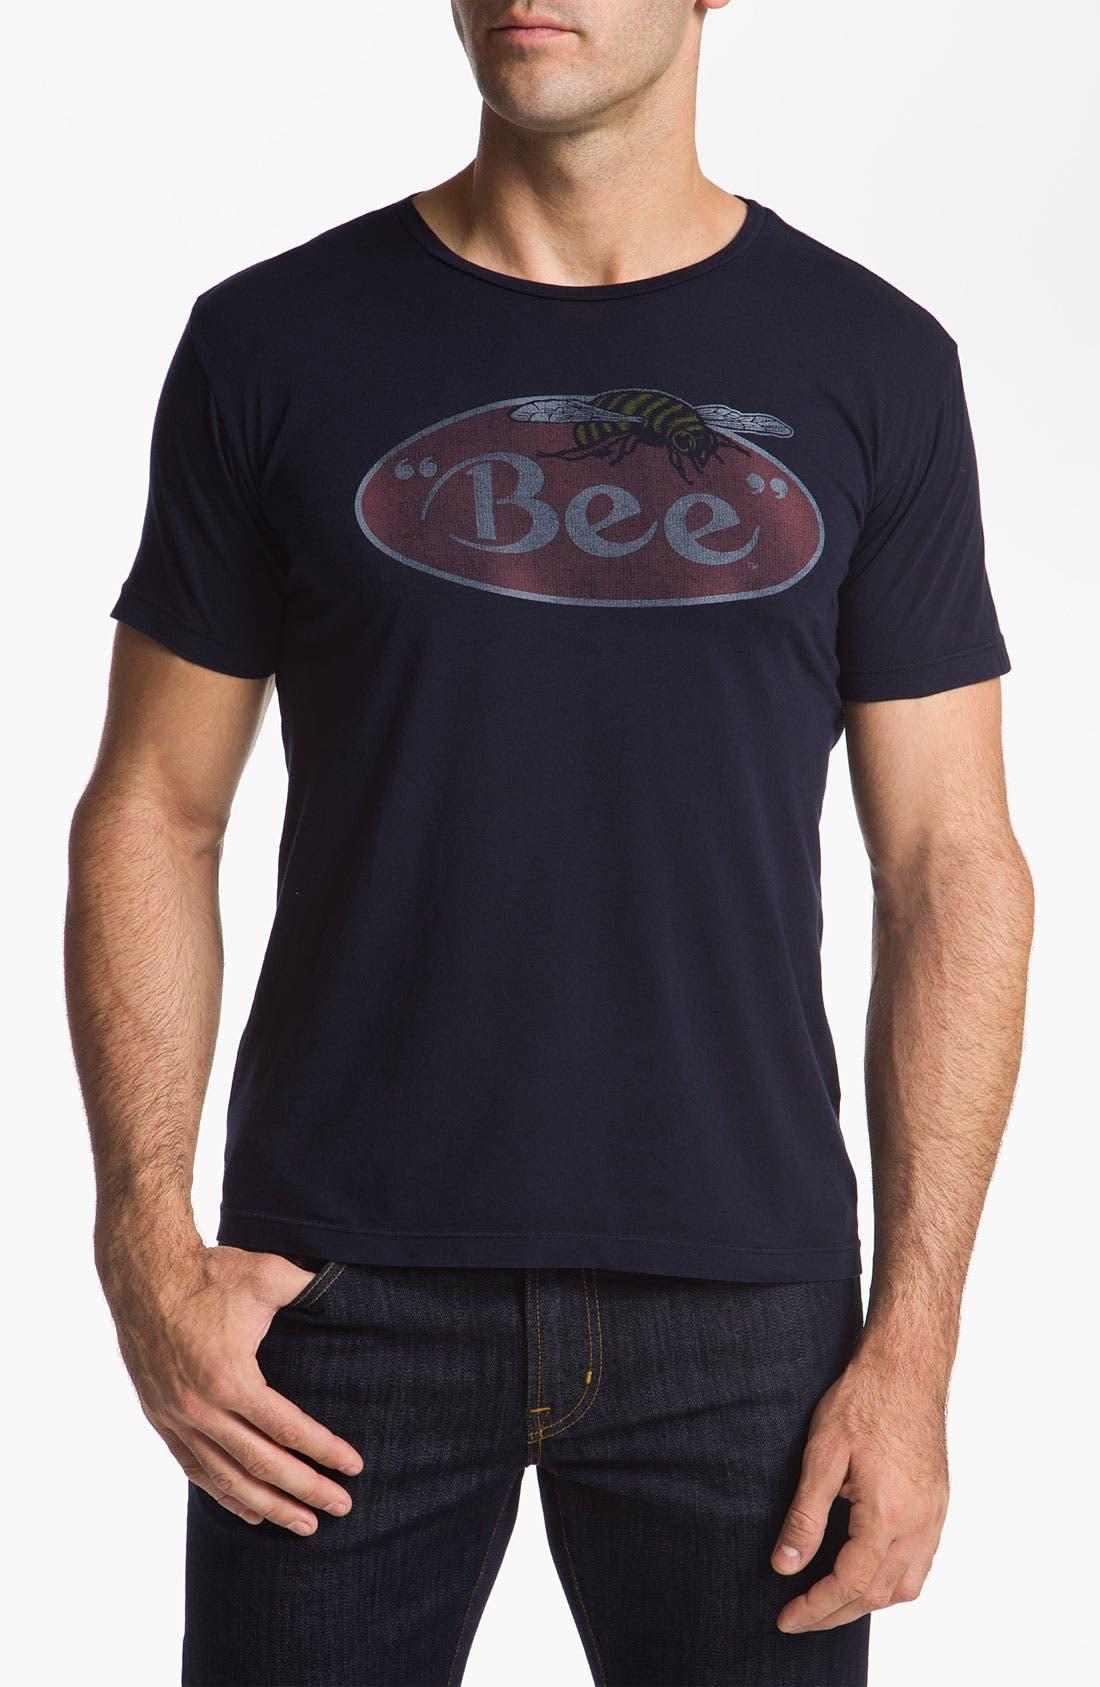 Main Image - Jacks & Jokers 'Circle Bee' T-Shirt